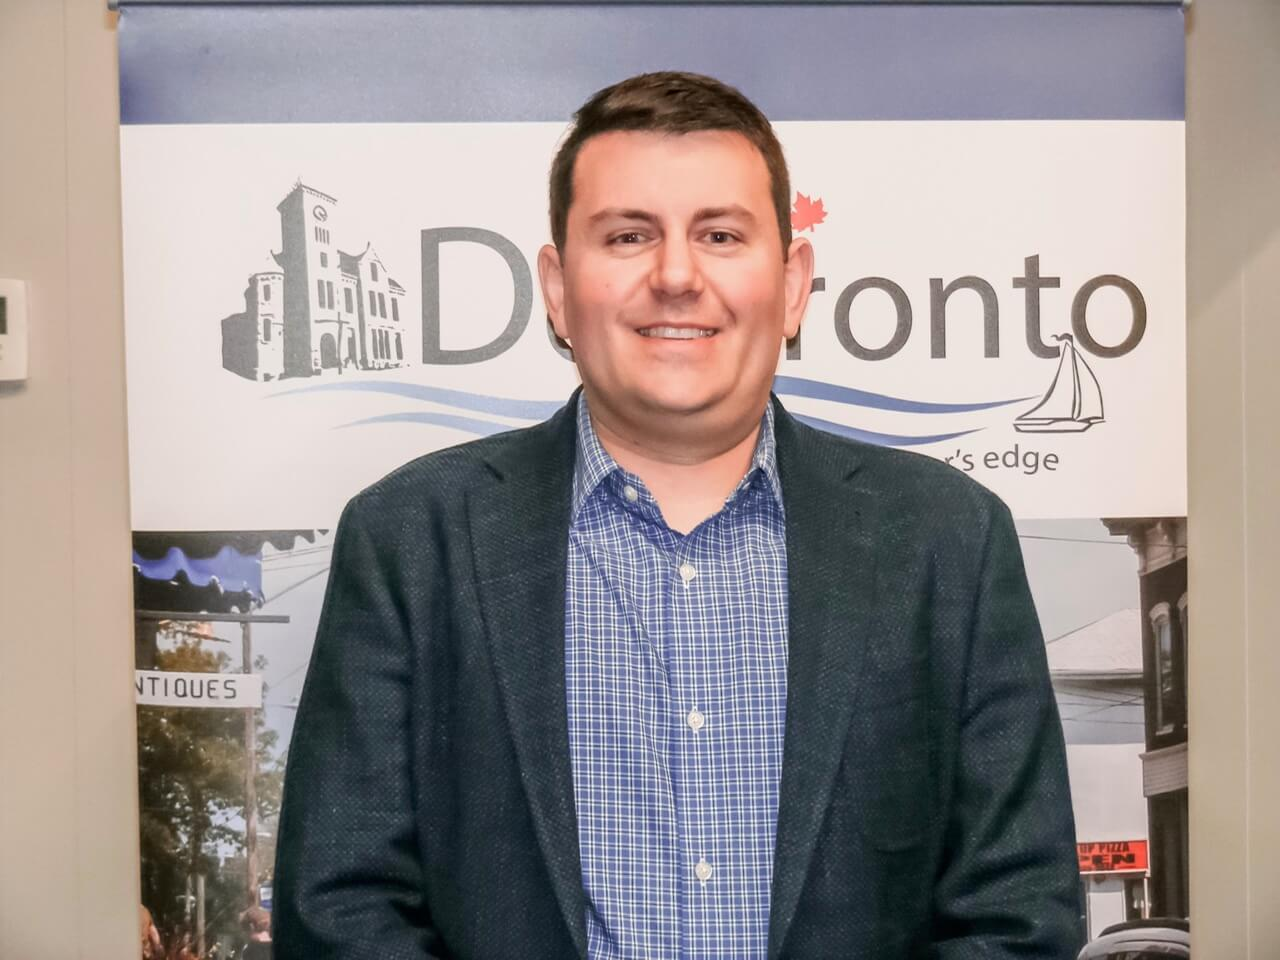 Deputy Mayor - Steven Everhardus 613-919-3733severhardus@deseronto.ca